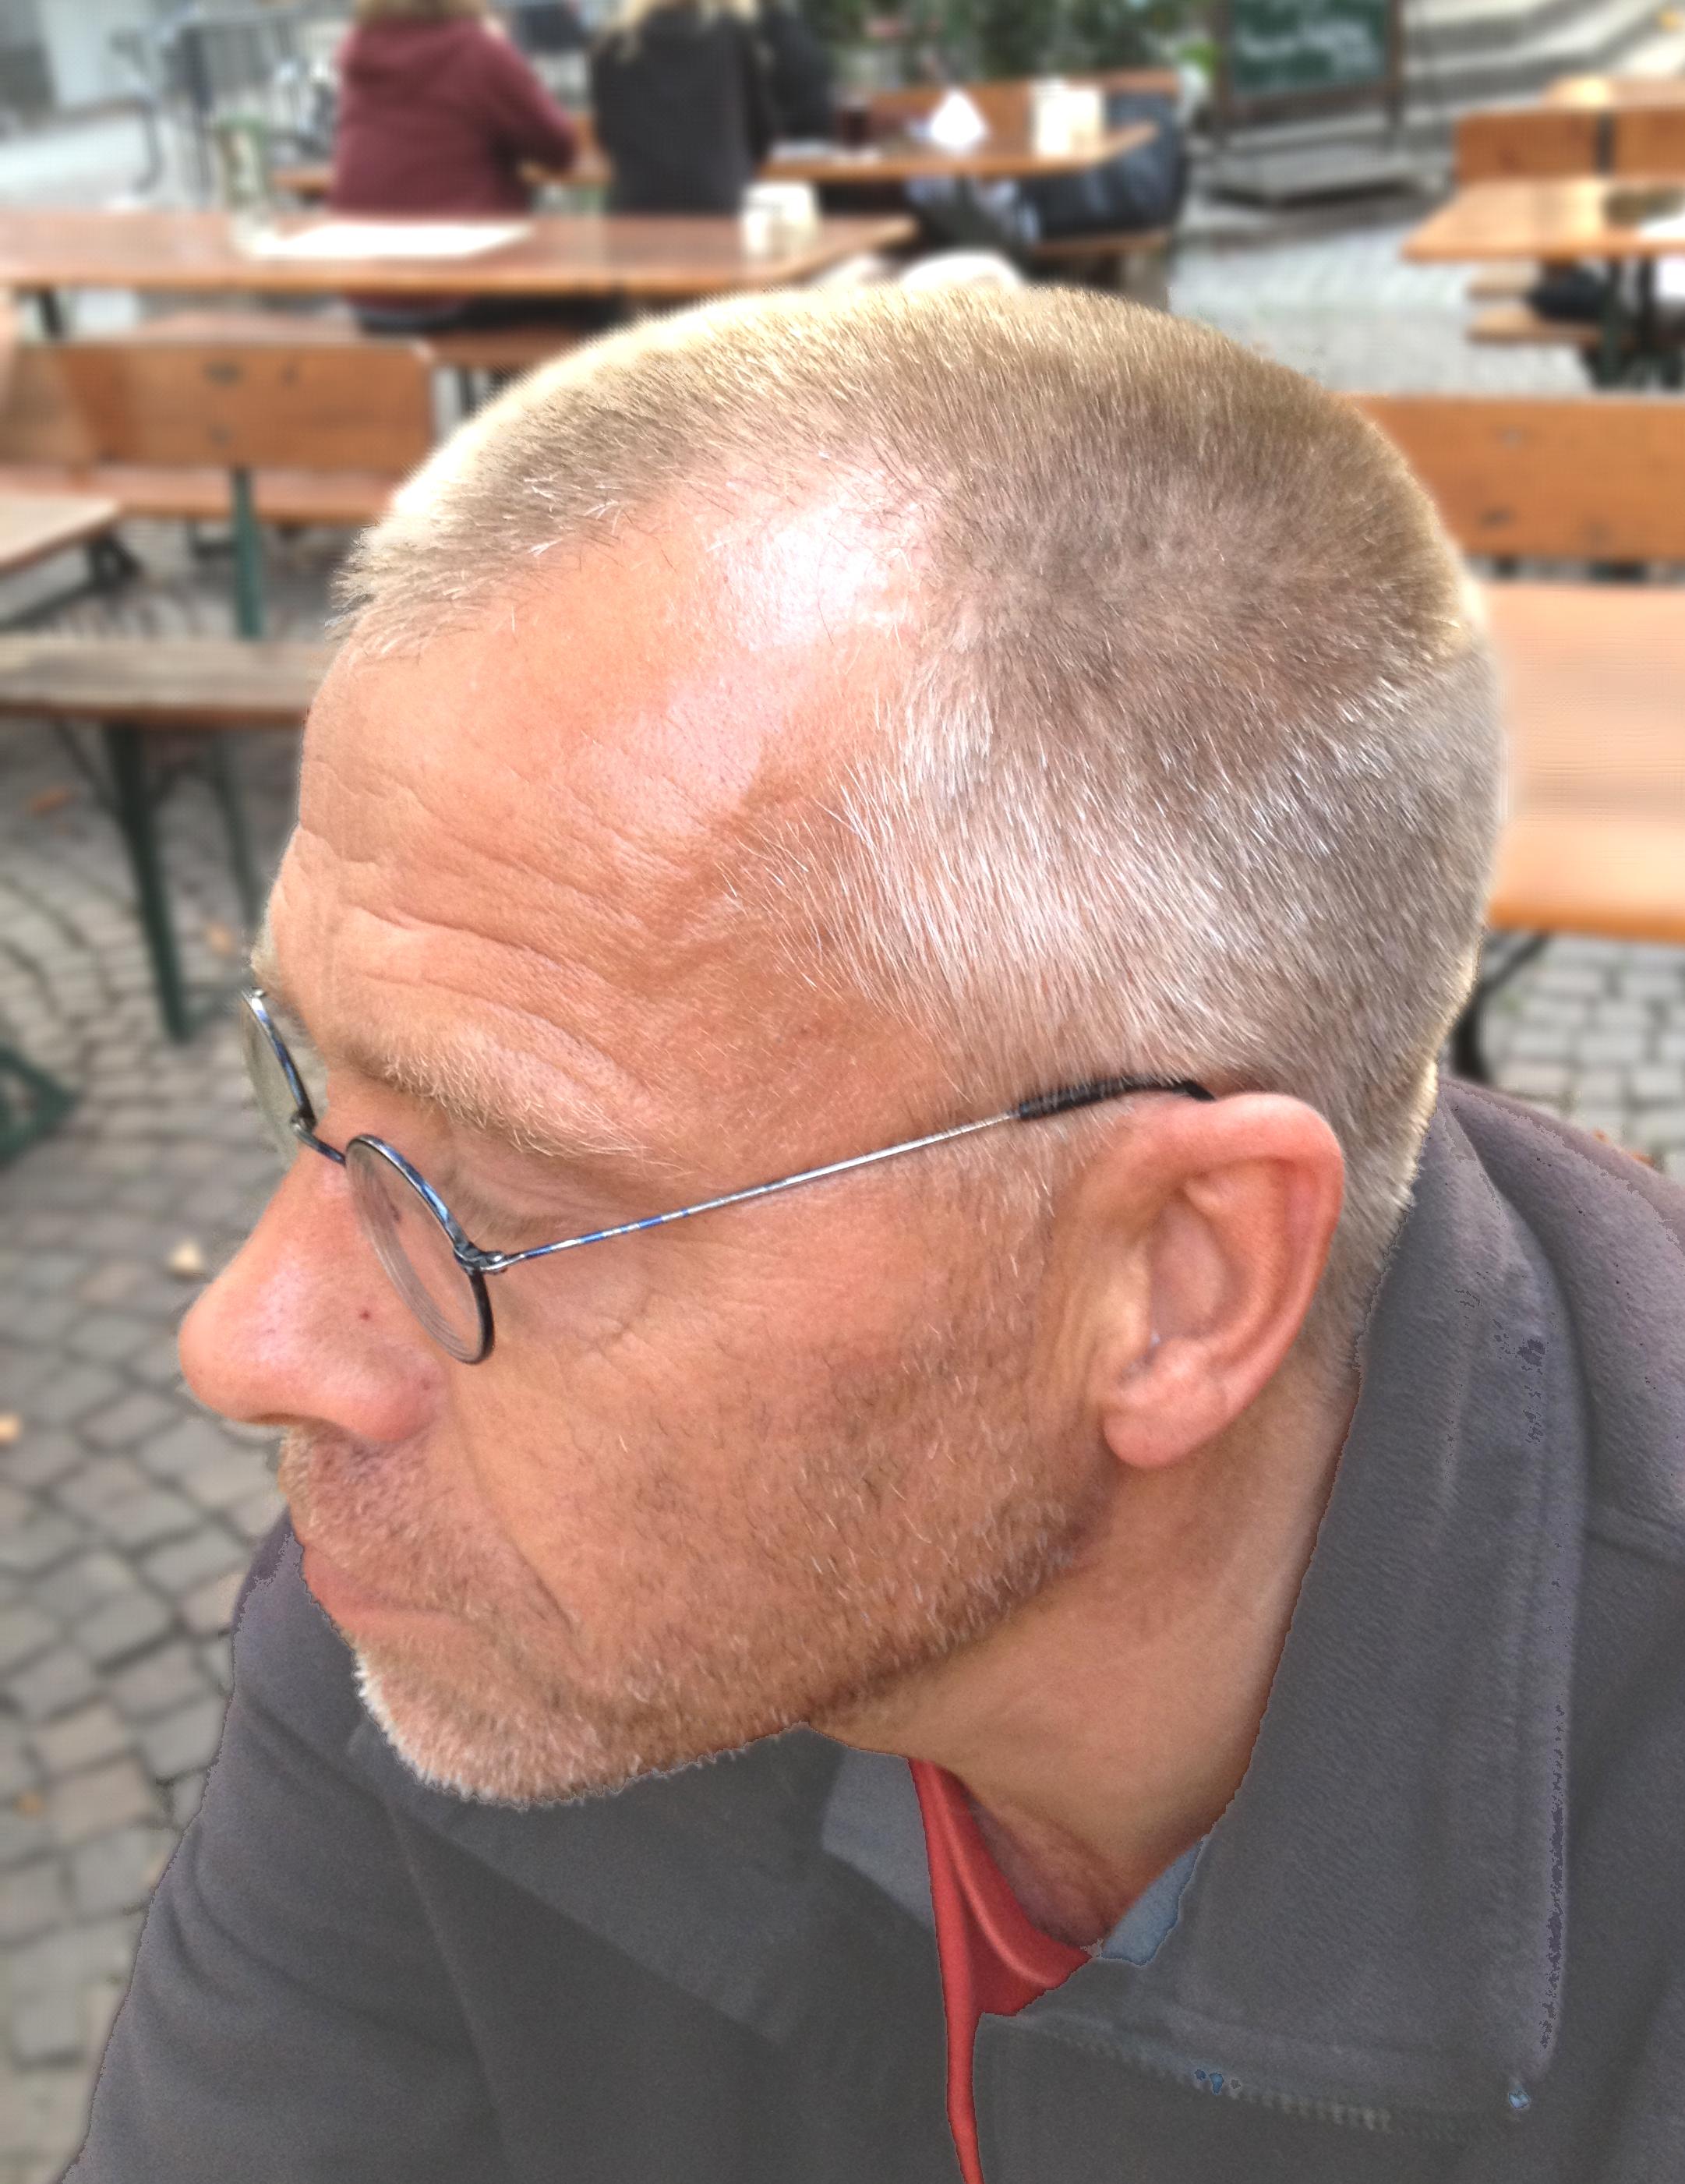 Meckifrisur – Wikipedia